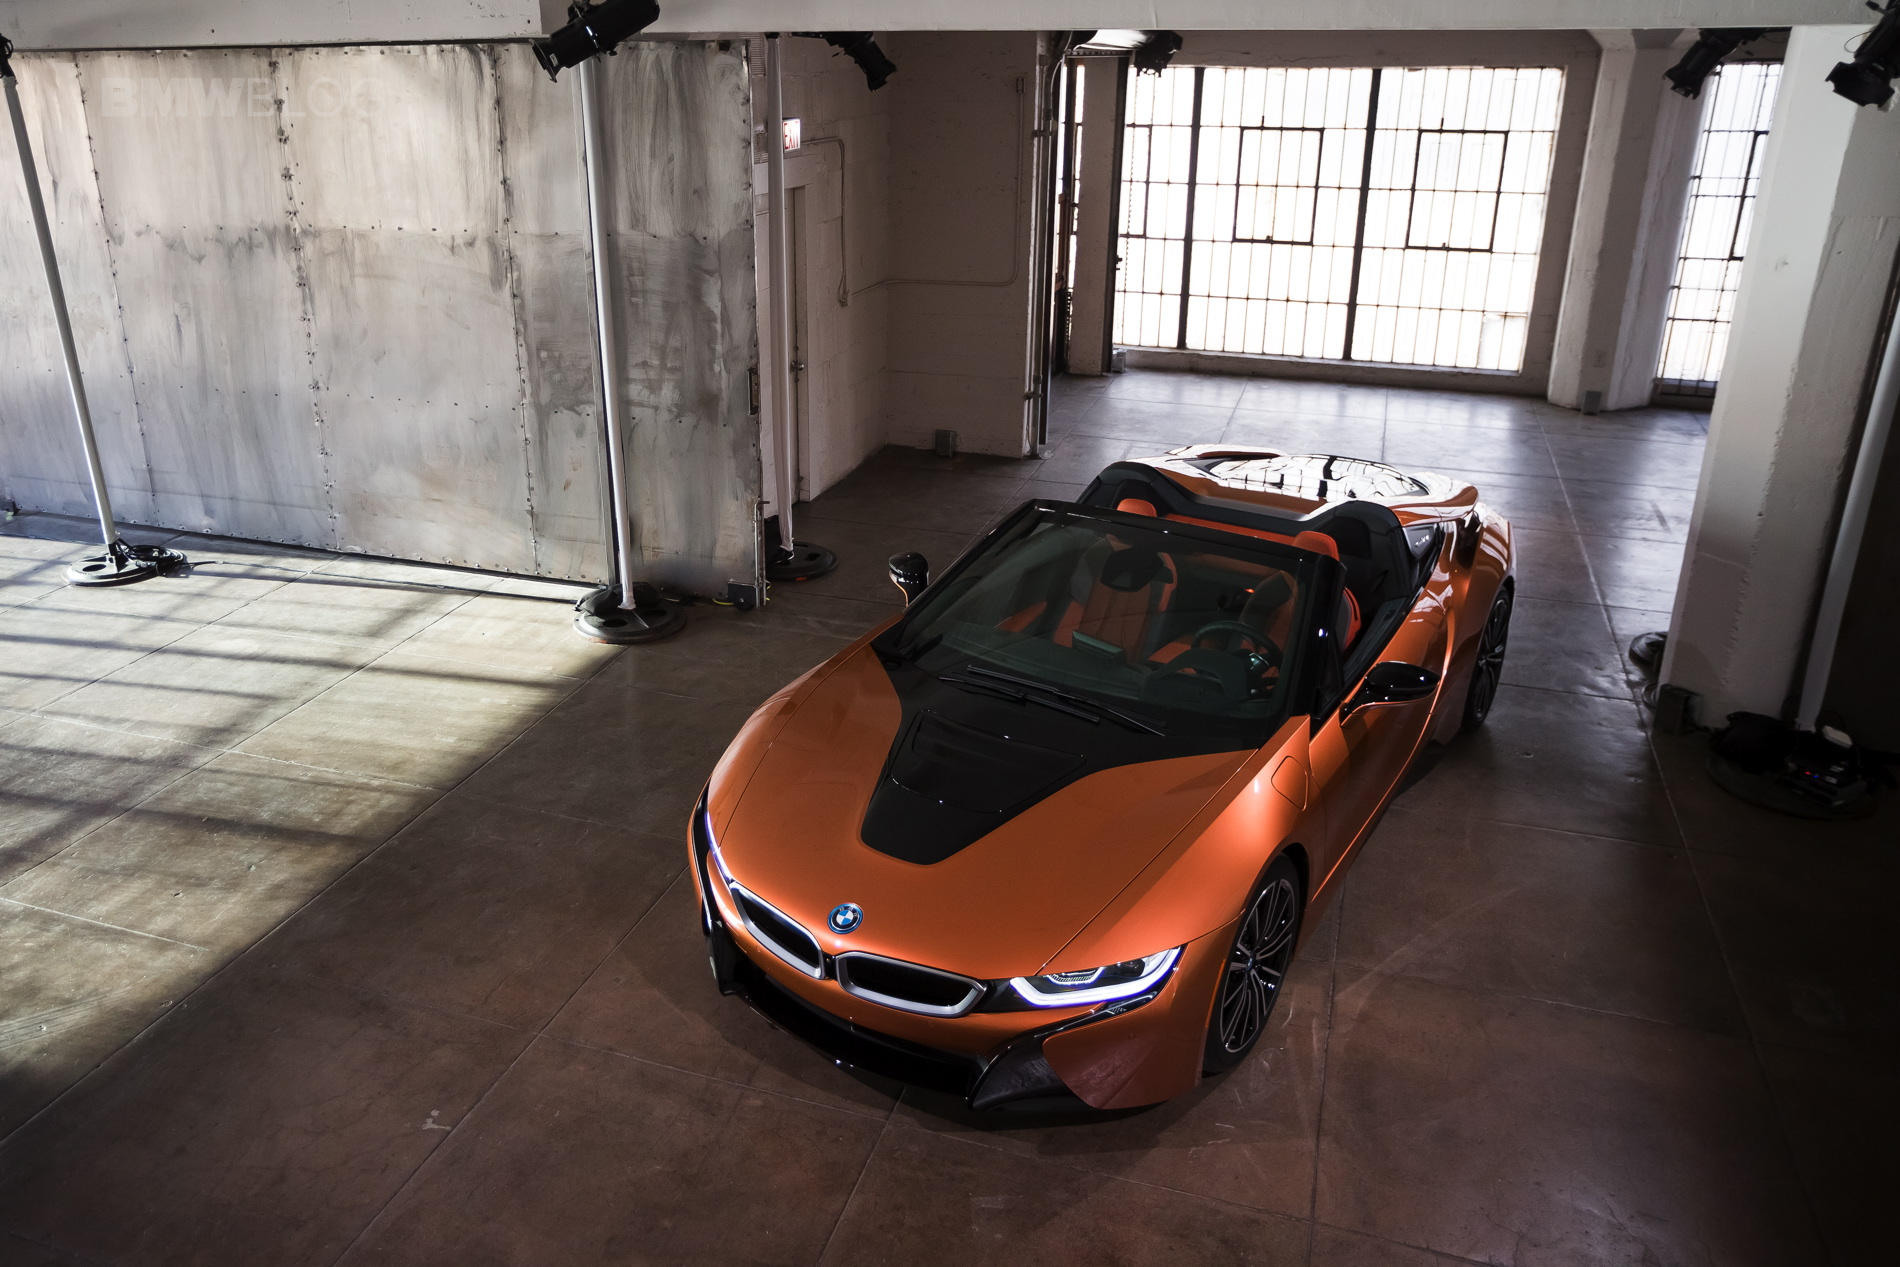 2018-BMW-i8-Roadster-28.jpg